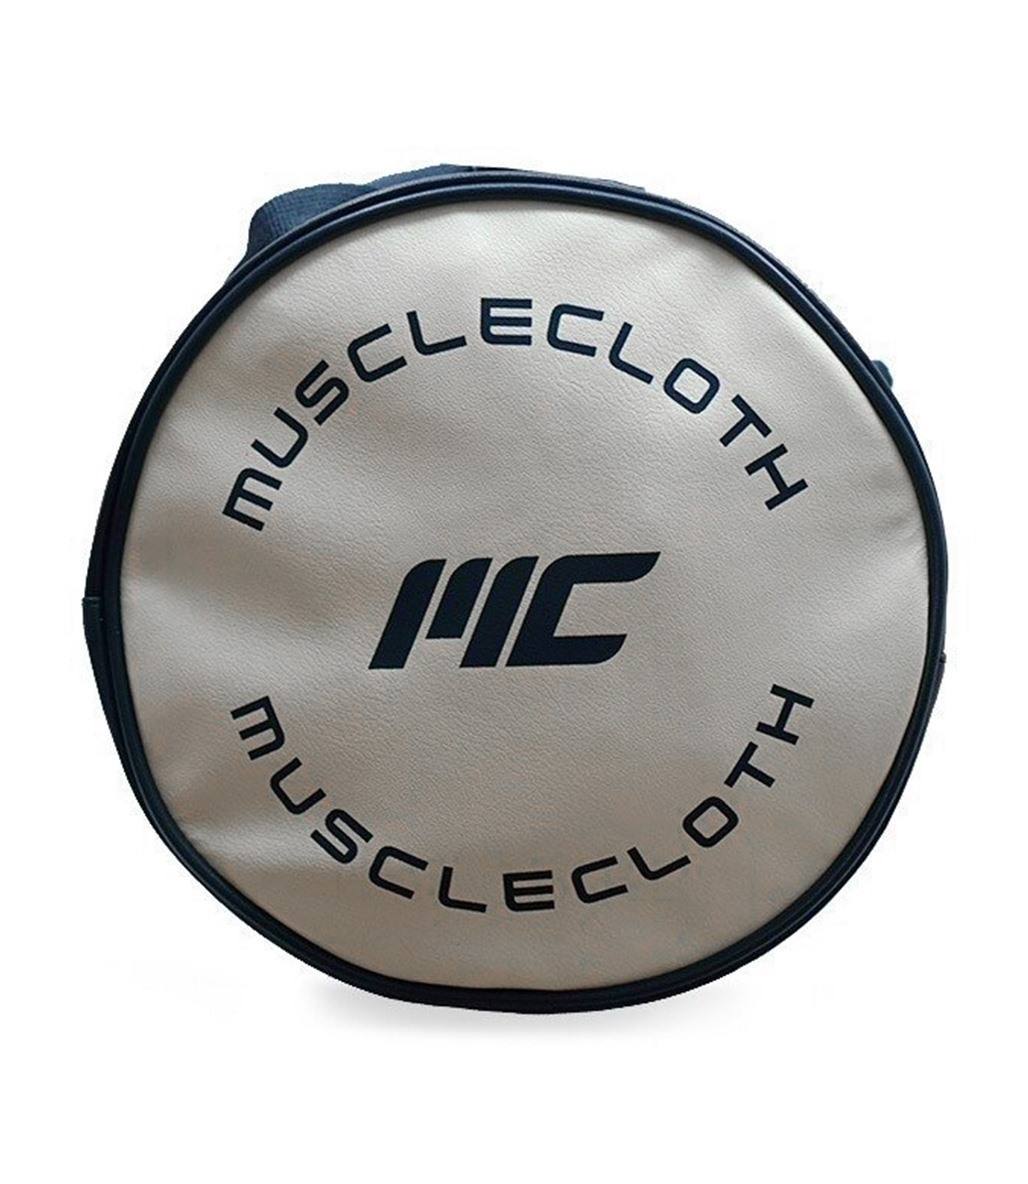 MuscleCloth Deri Silindir Çanta Lacivert